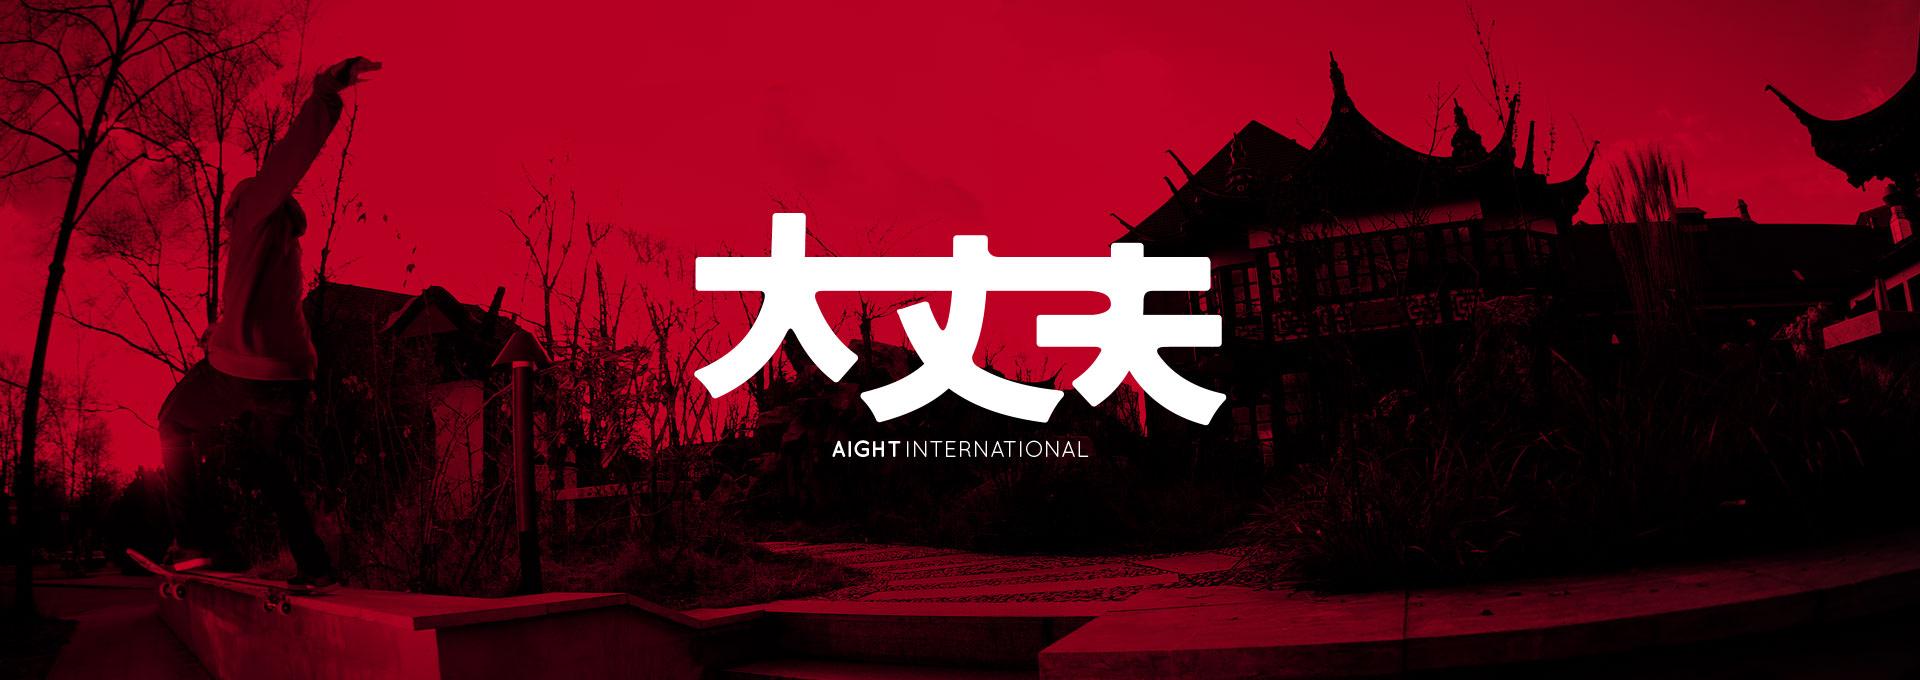 Aight* International Kollektion